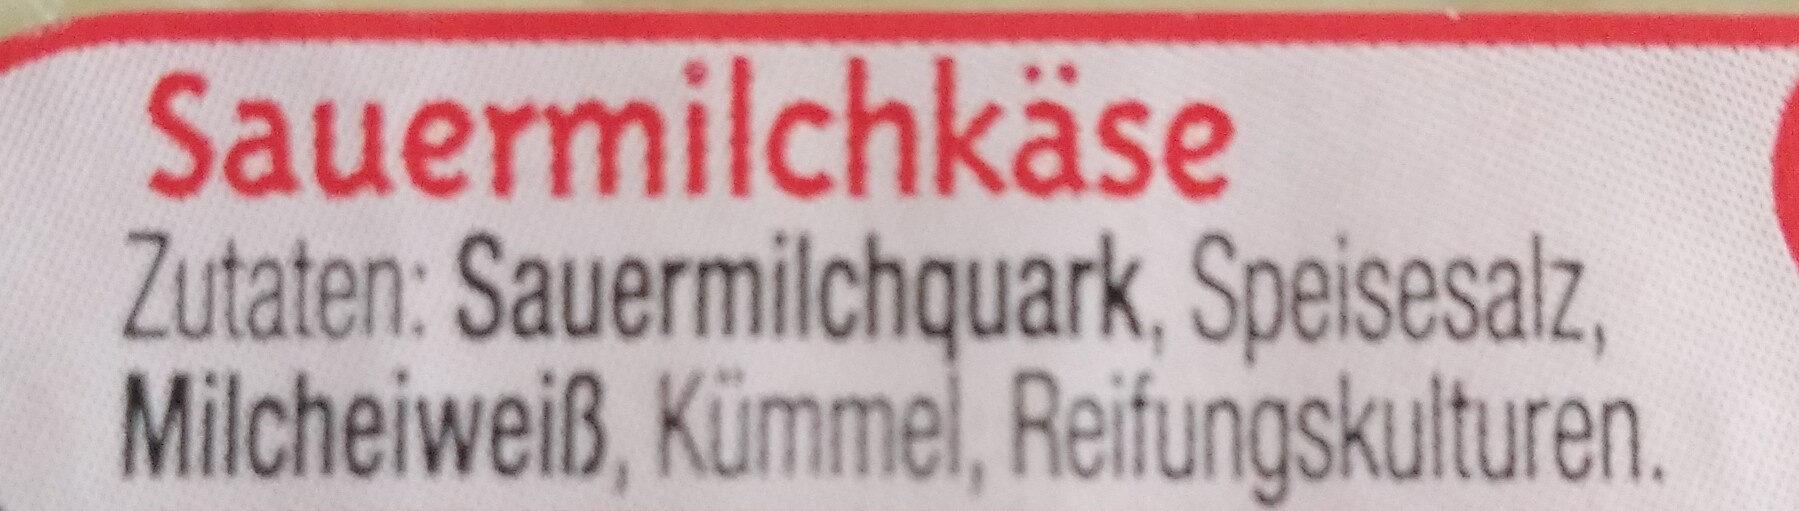 Handkäse, Olmützer Quargel - Ingrédients - de